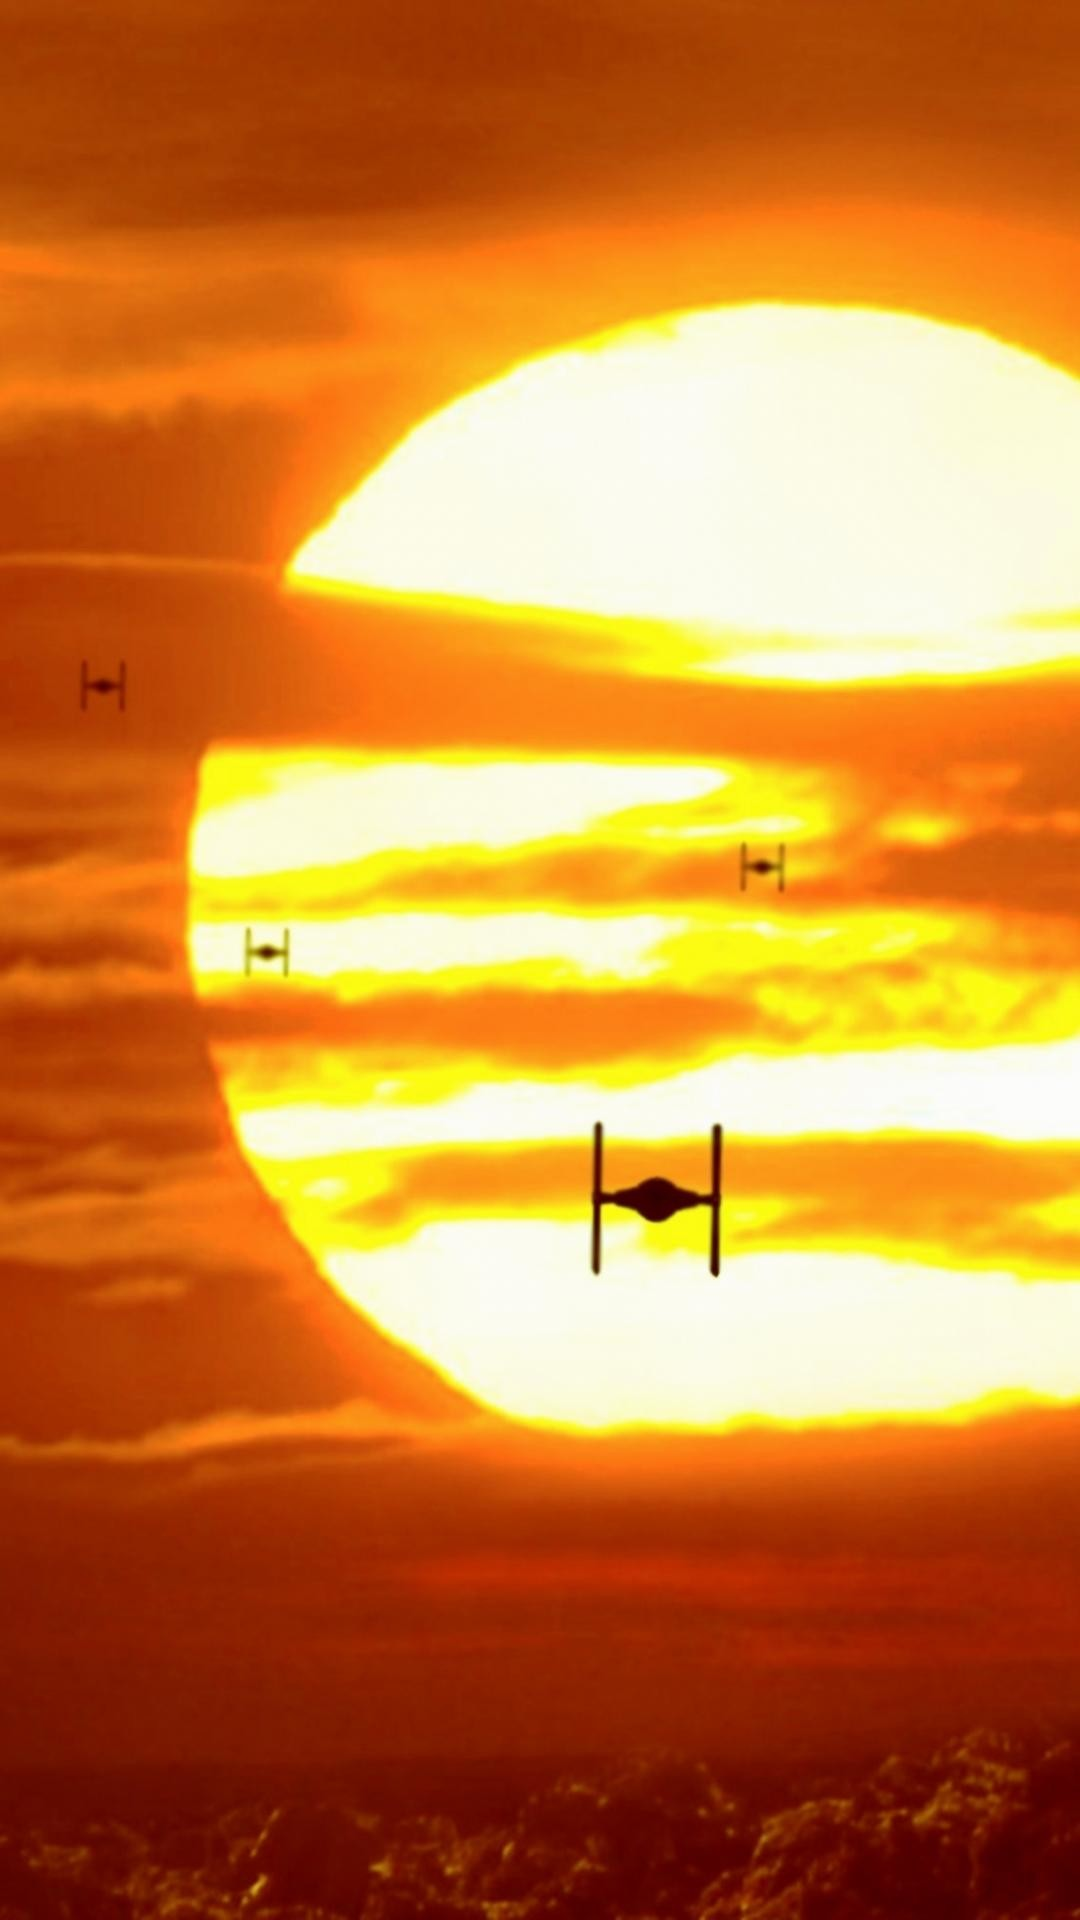 Movie-Star-Wars-Episode-VII-The-Force-Awakens-